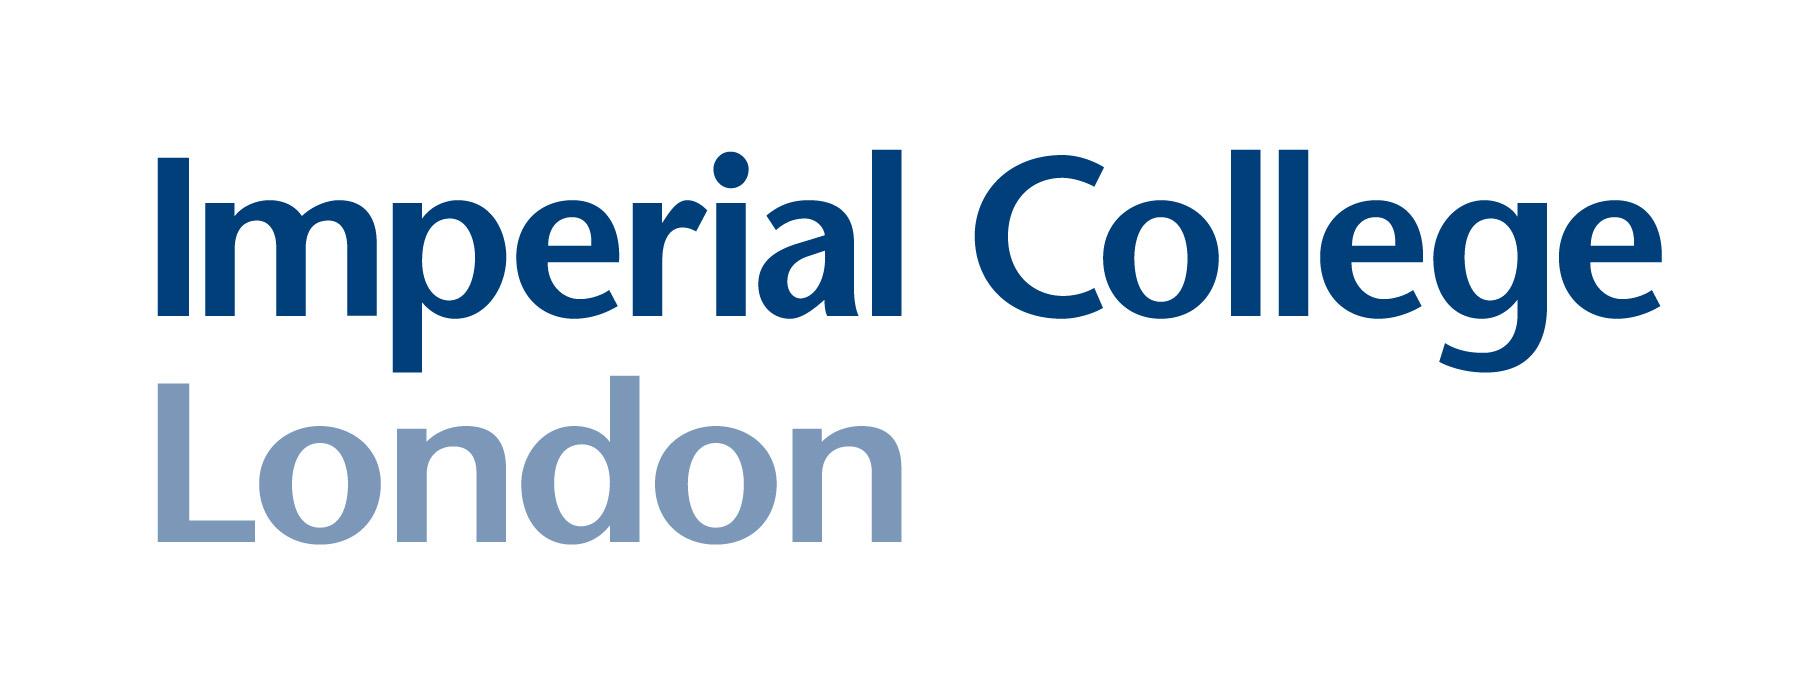 Imperial_College_London_logo.jpg